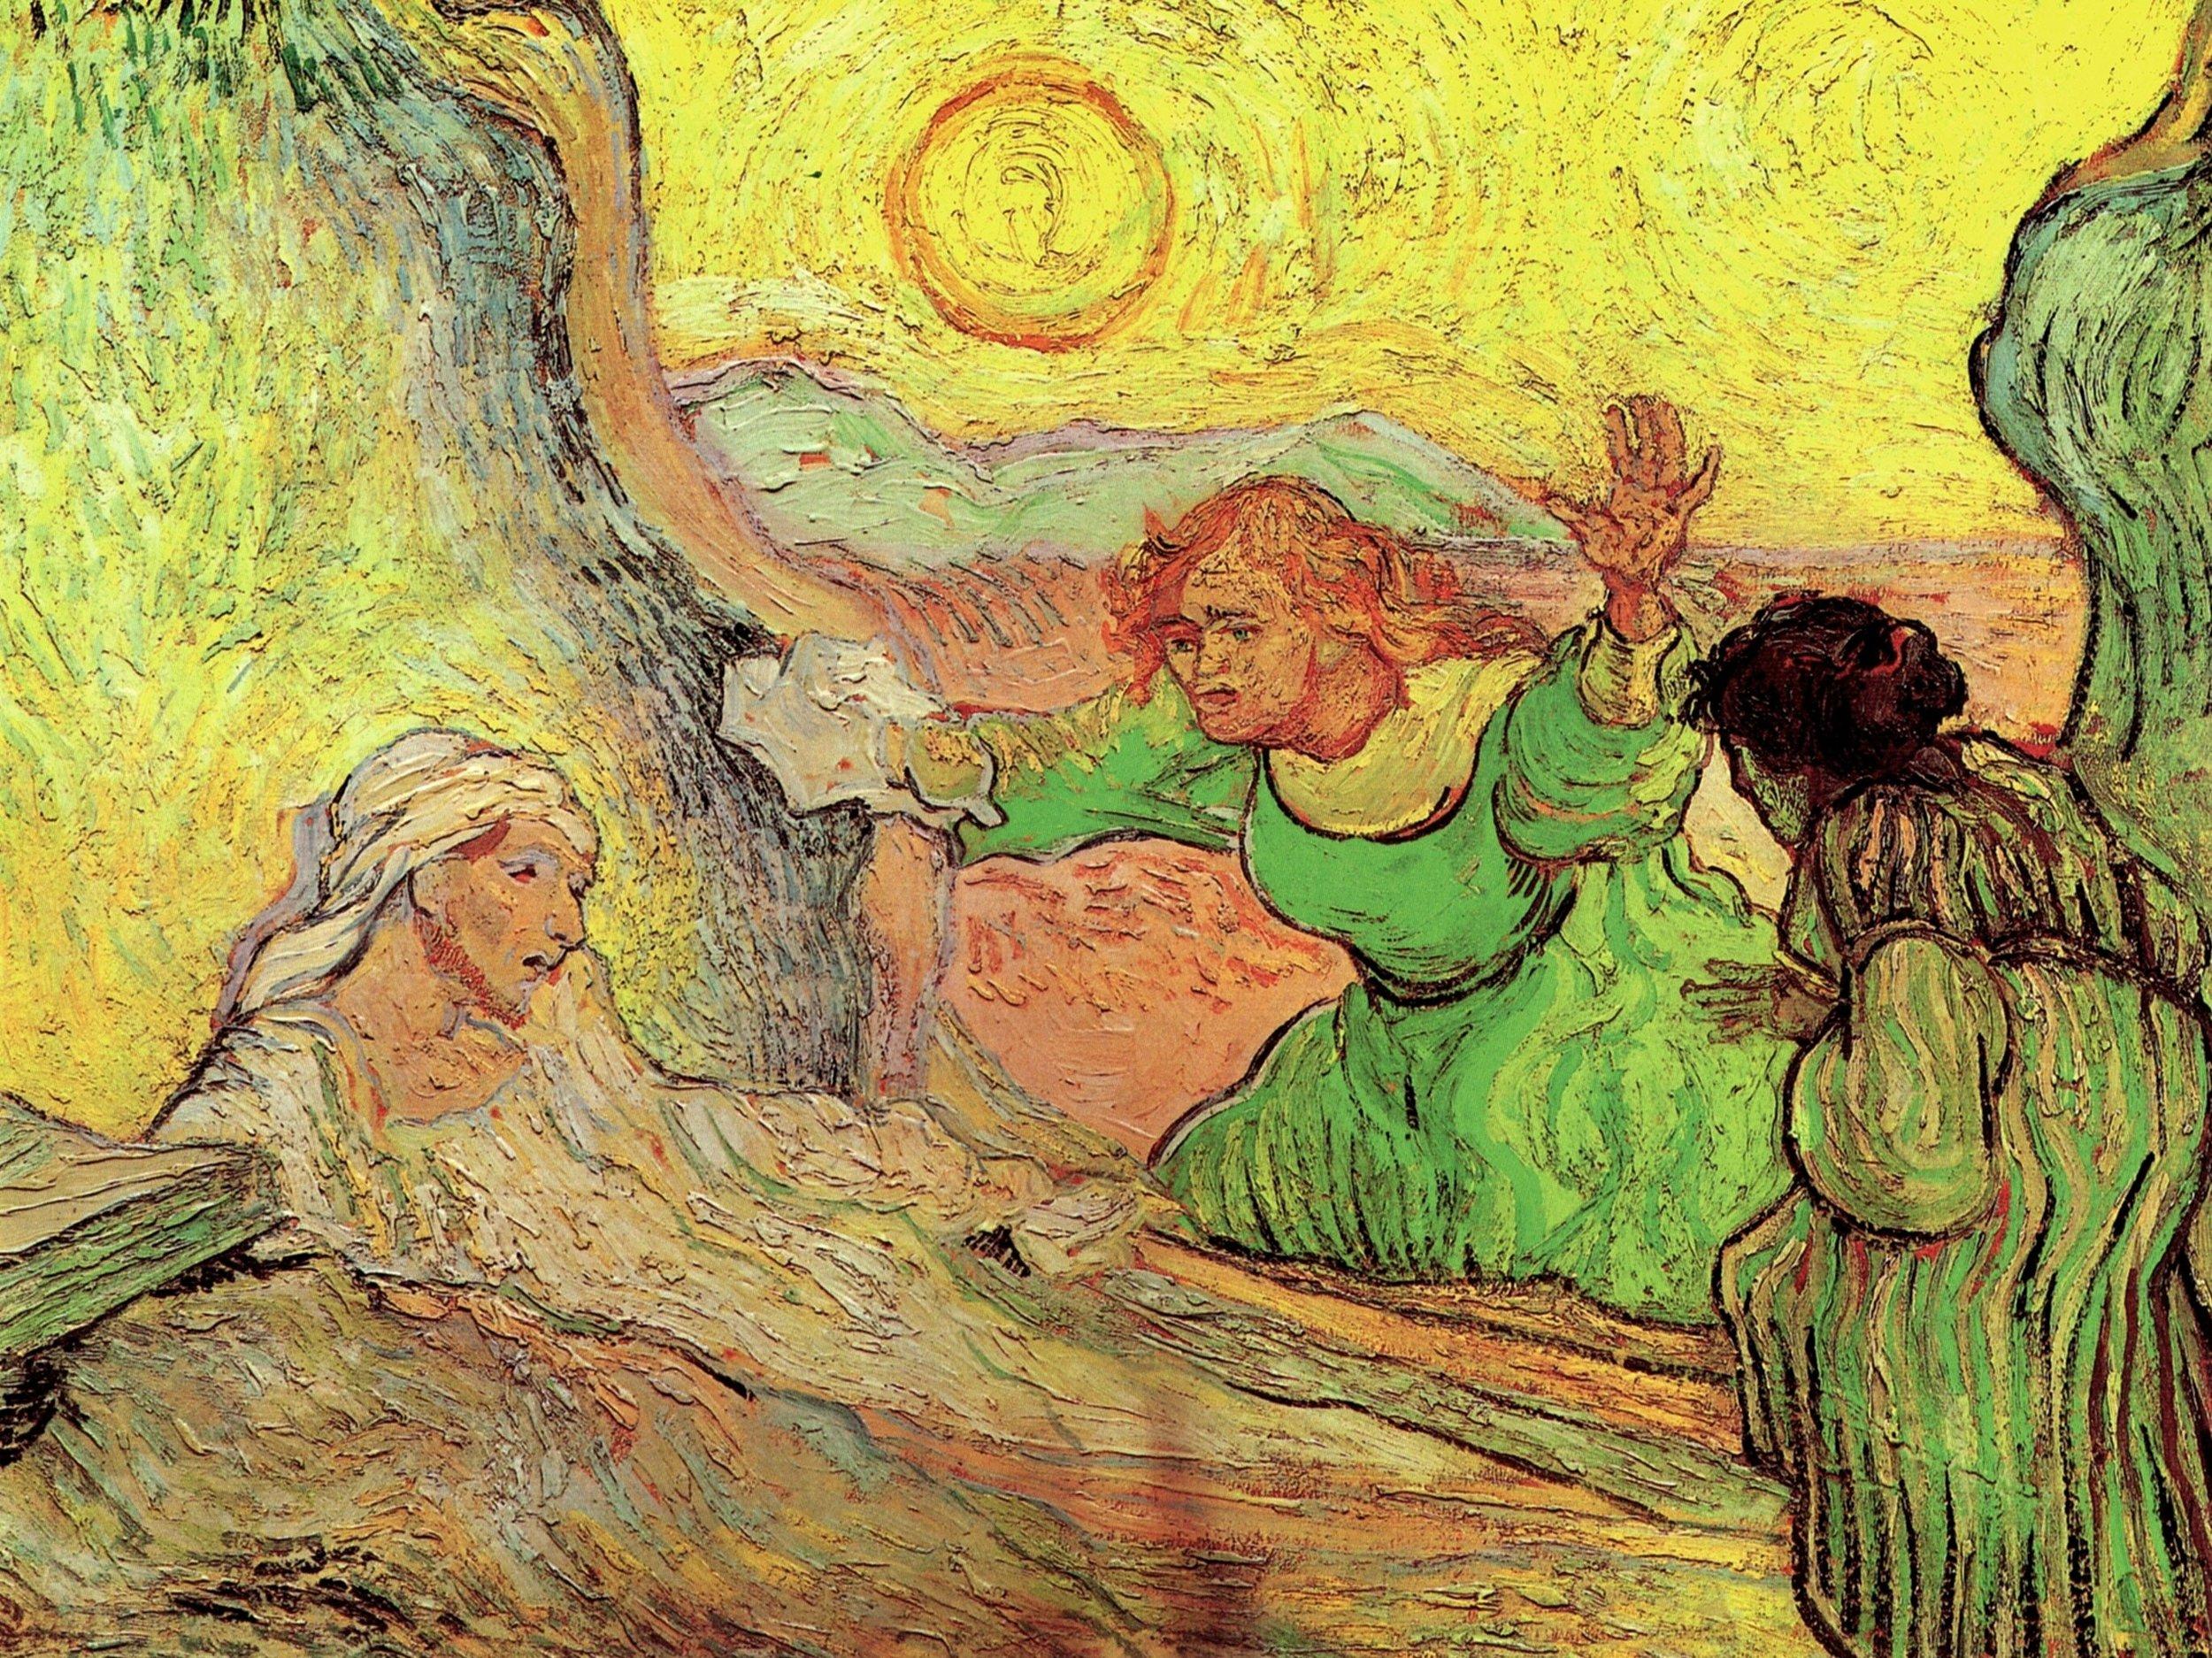 The Raising of Lazarus after Rembrandt, Vincent Van Gogh, 1890.